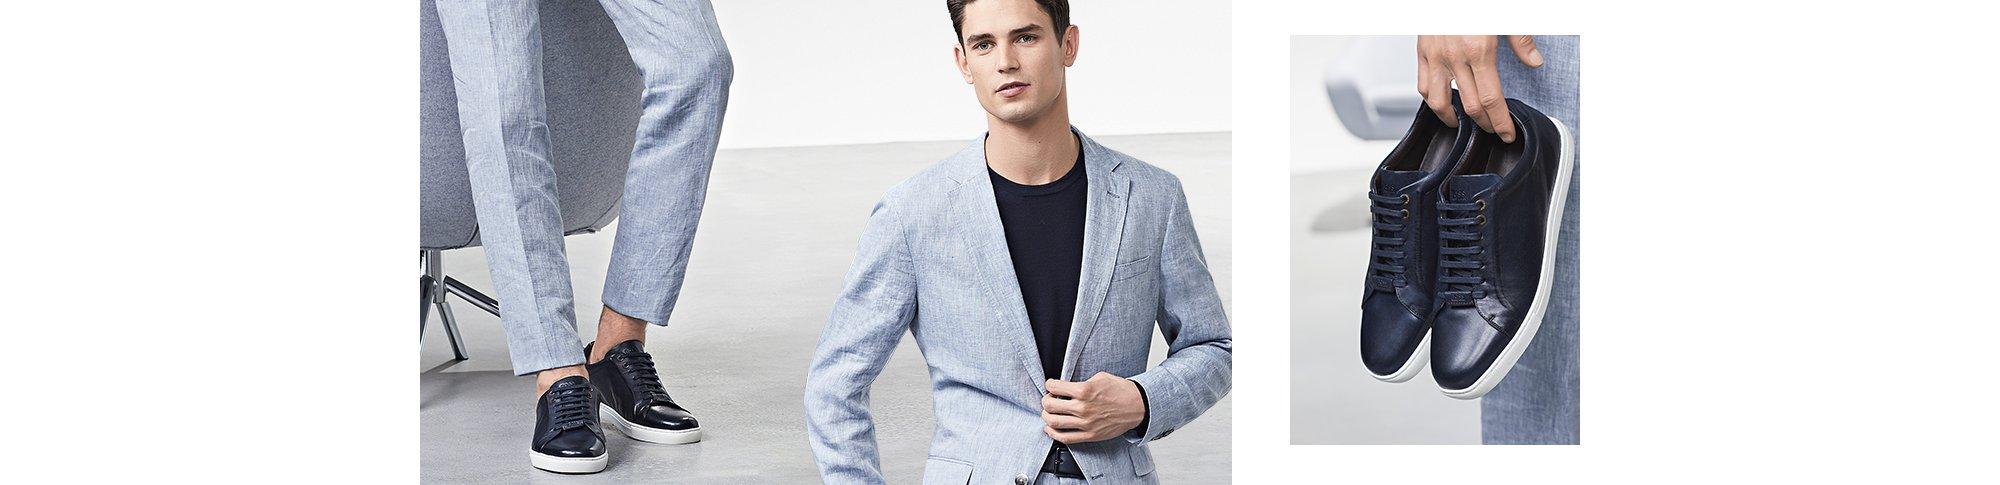 Boss How To Anzug Und Schuhe Farblich Abstimmen Hugo Boss